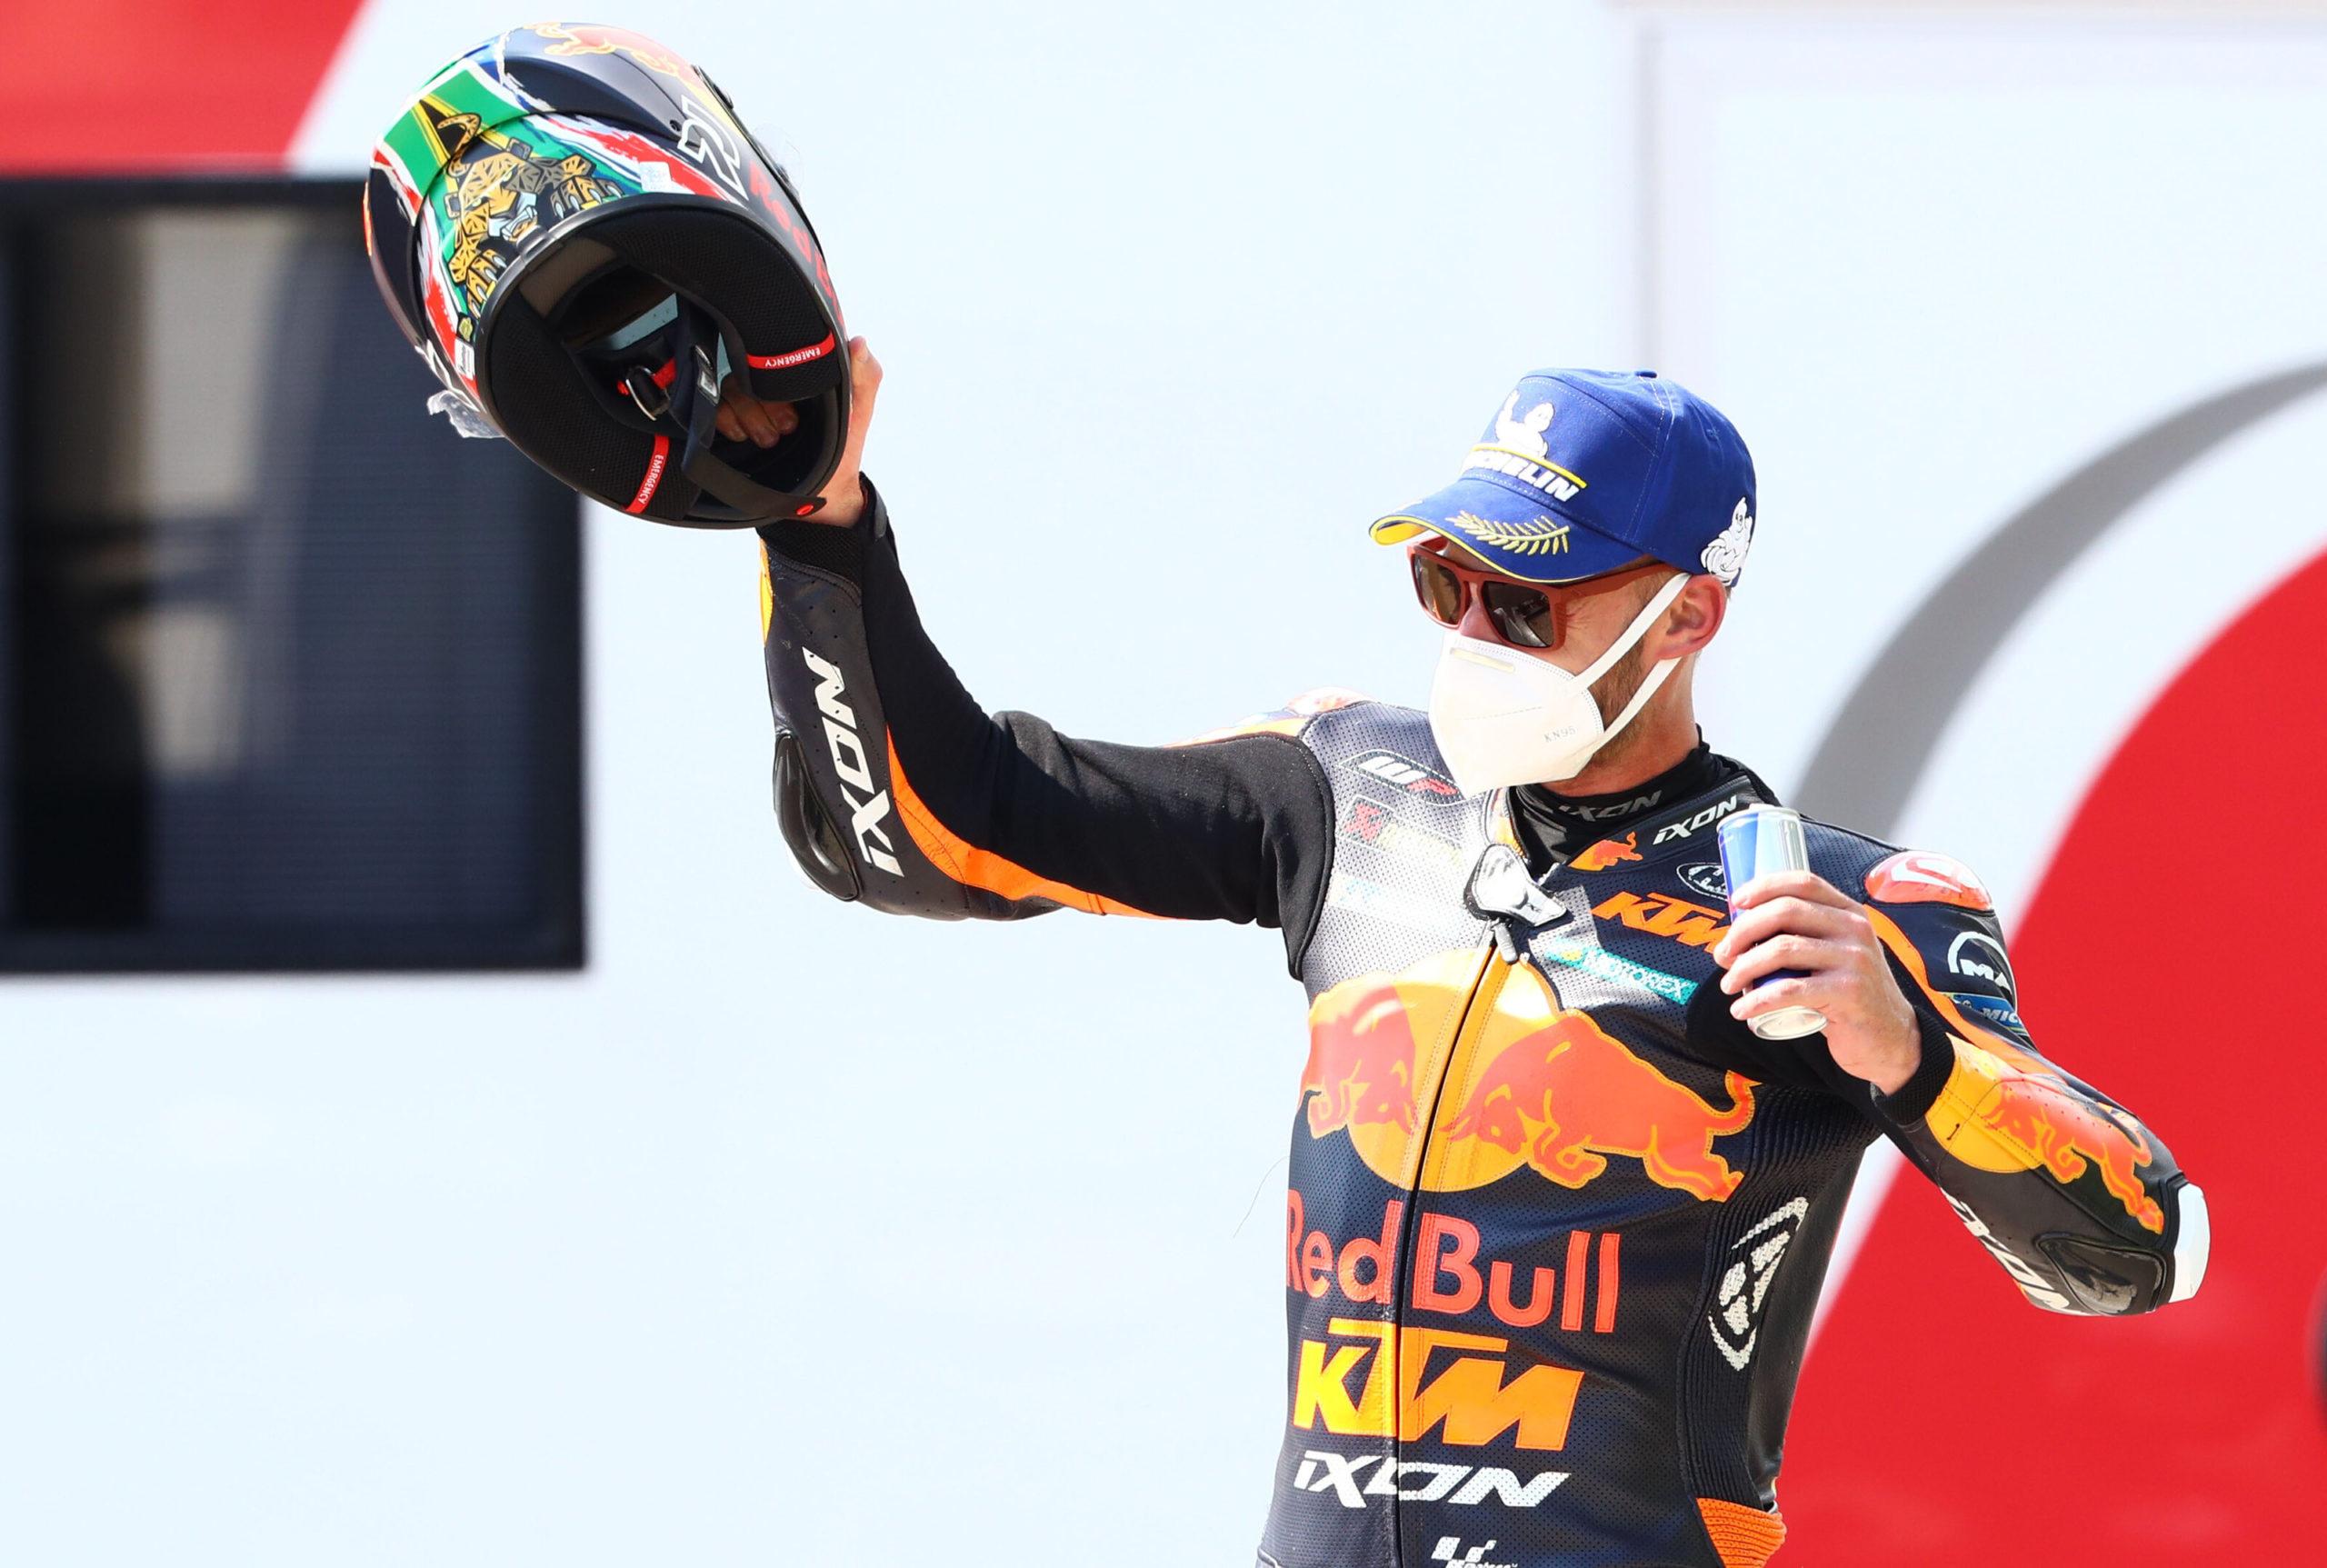 SA rookie Brad Binder stuns the world at Czech MotoGP - Daily Maverick